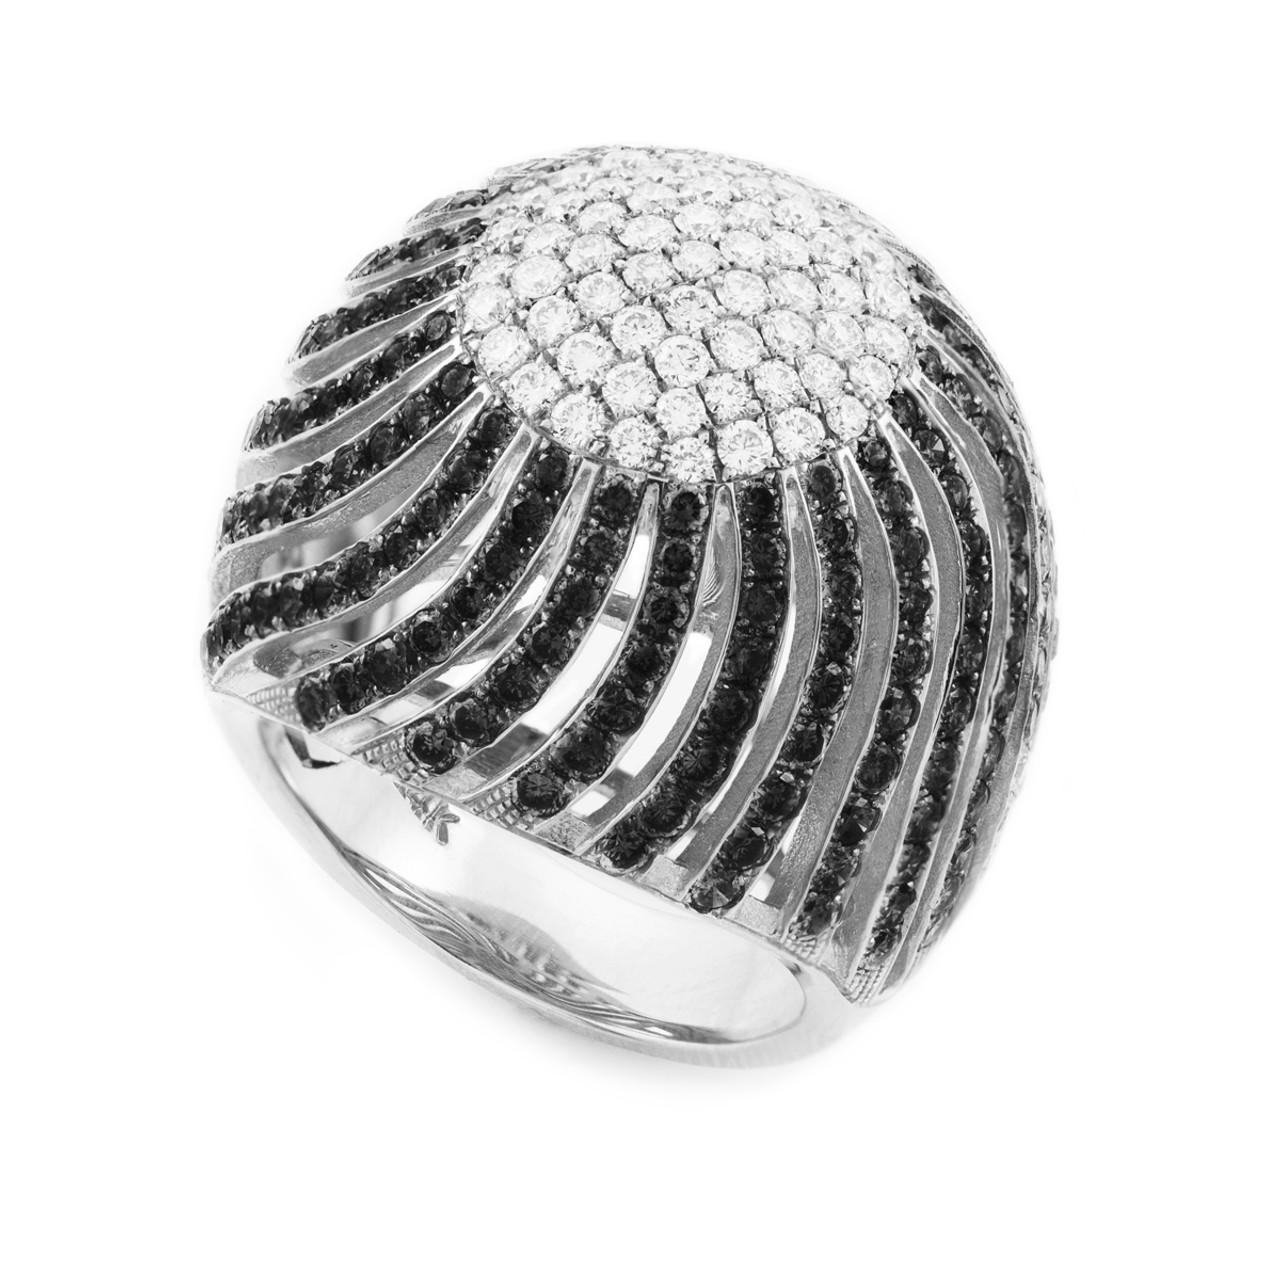 14k white gold diamond pave cocktail ring. Black Bedroom Furniture Sets. Home Design Ideas